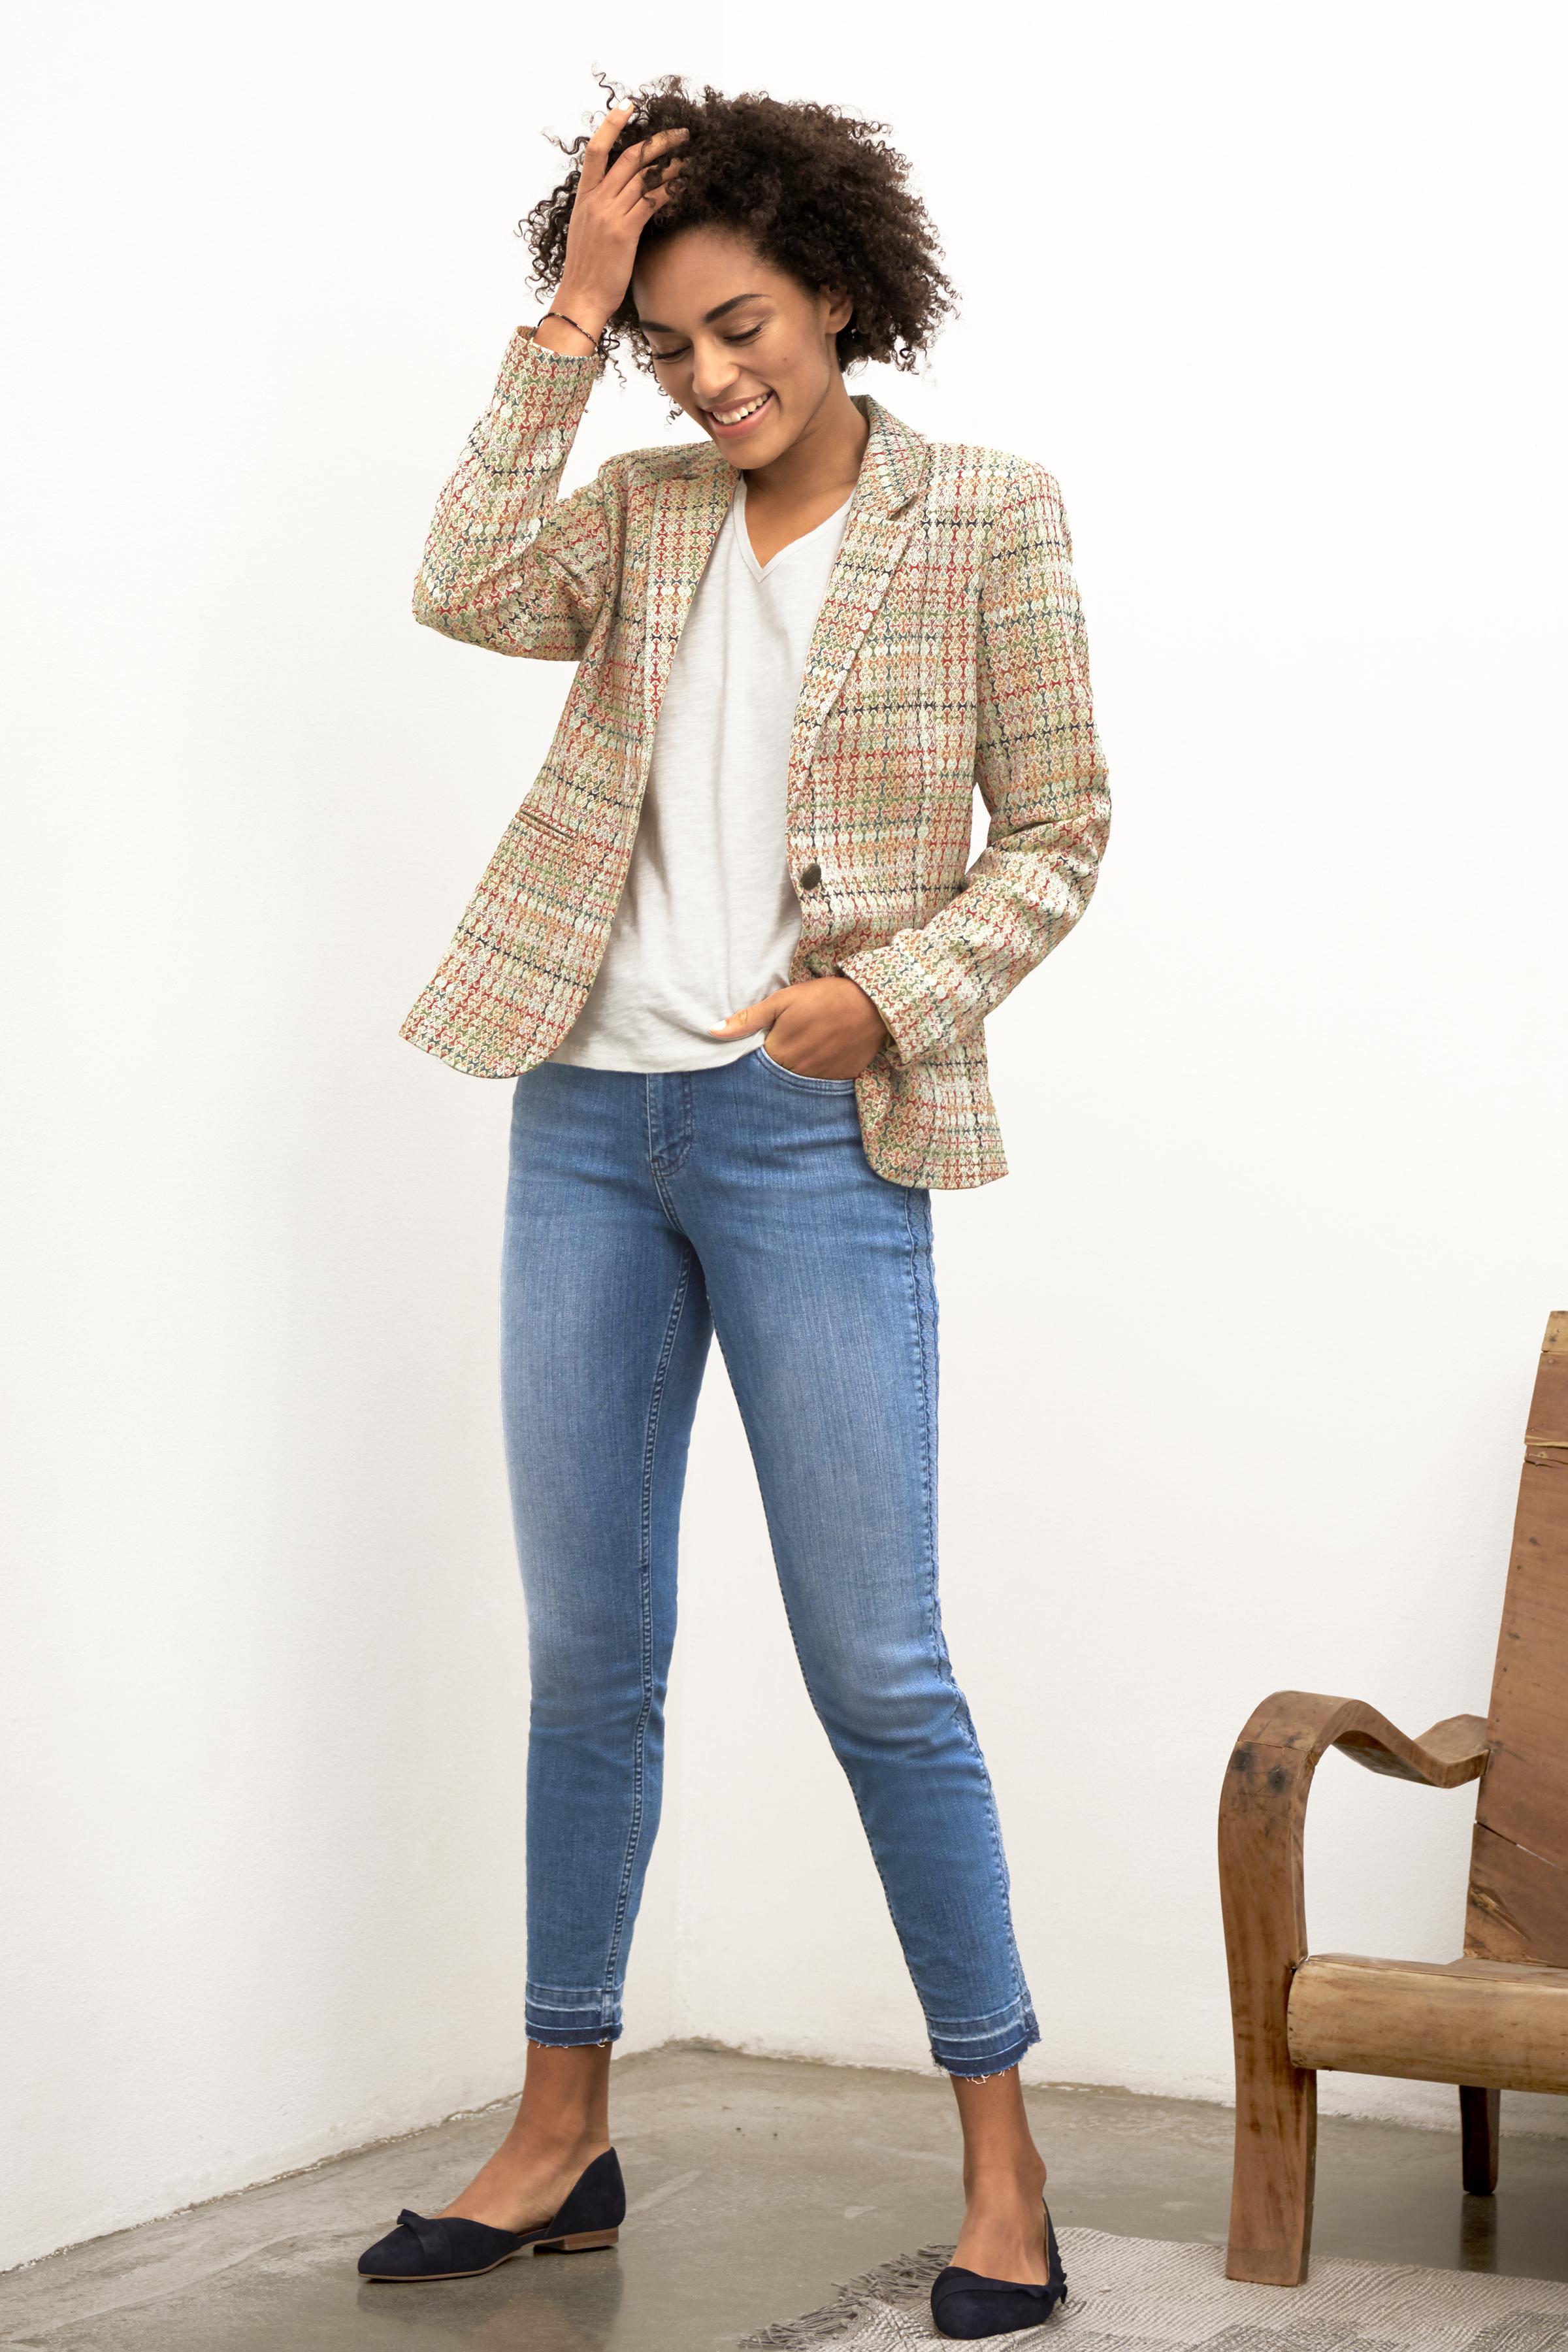 Denimblau Denim-Knöchelhose von Pulz Jeans – Shoppen Sie Denimblau Denim-Knöchelhose ab Gr. 25-35 hier